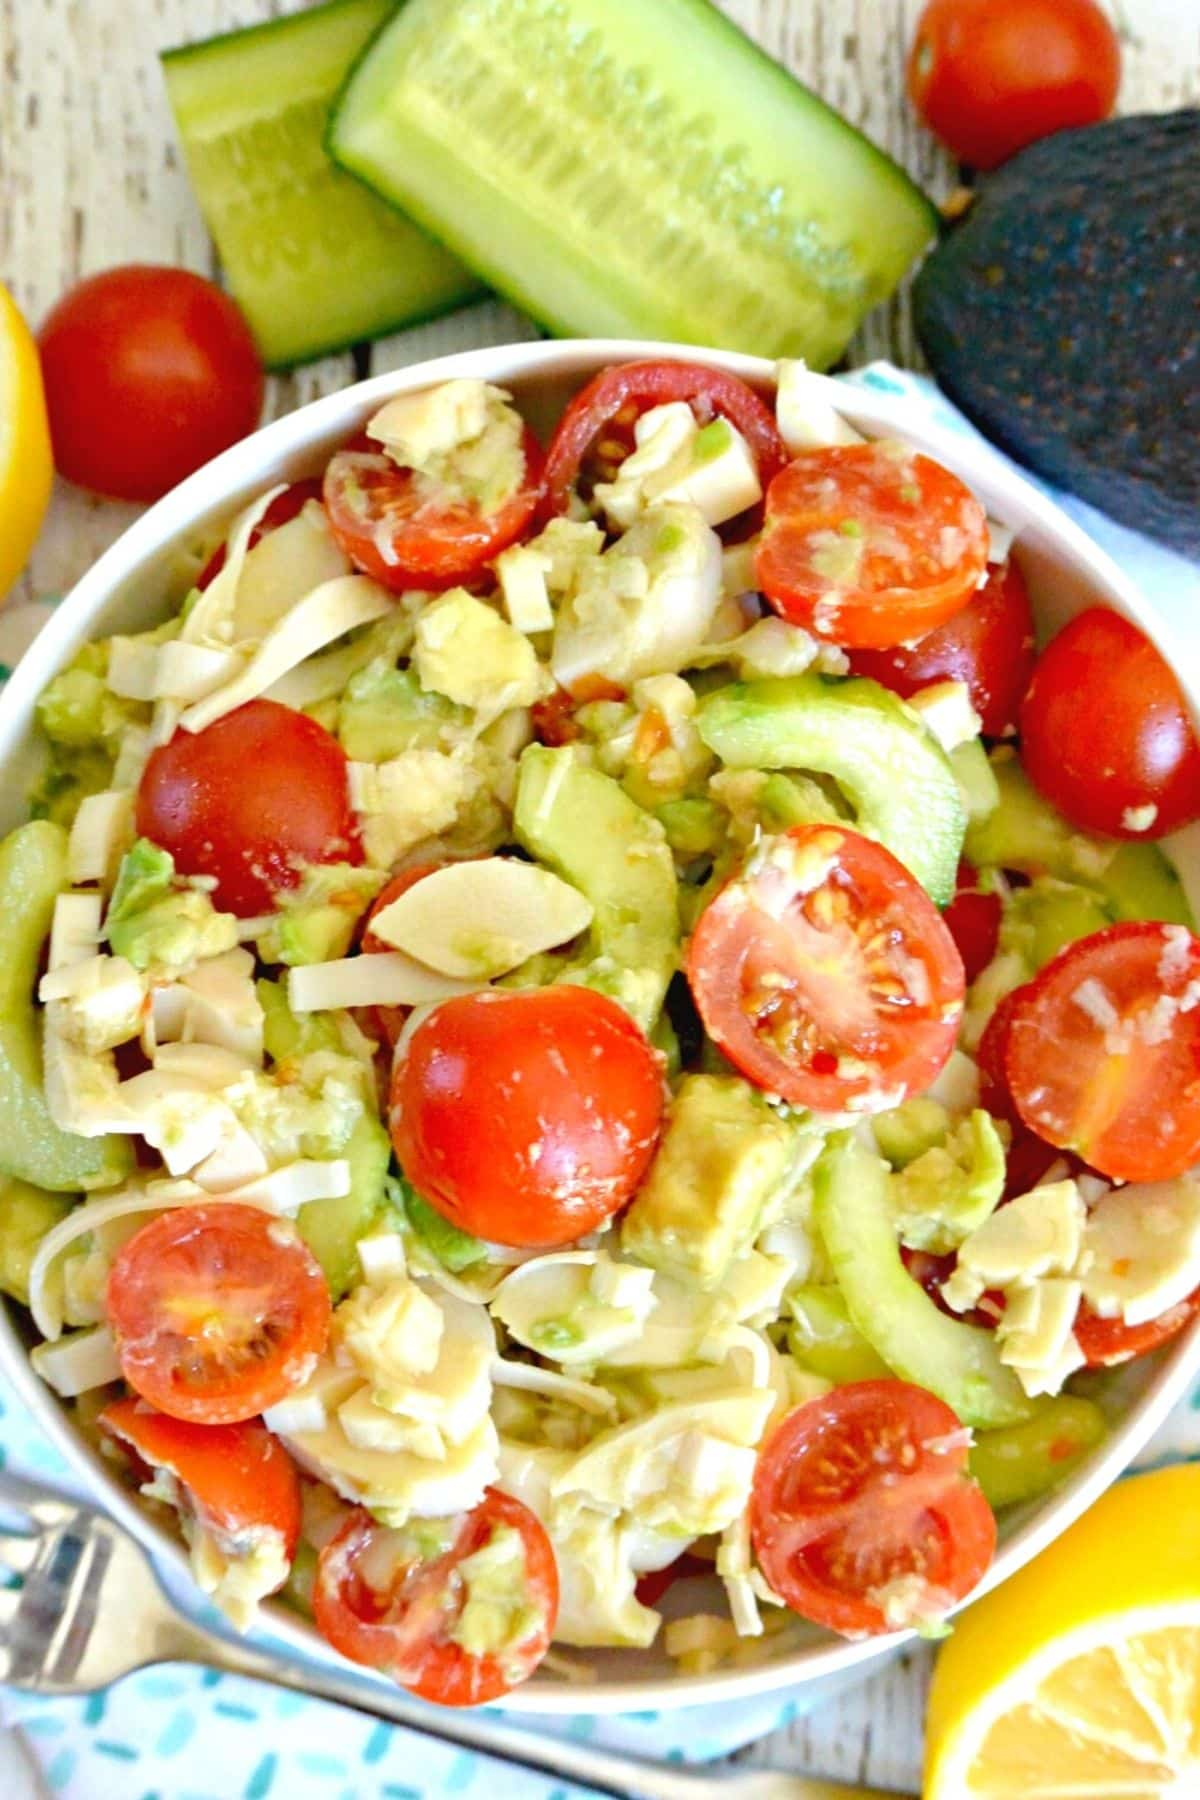 Close up overhead image of salad